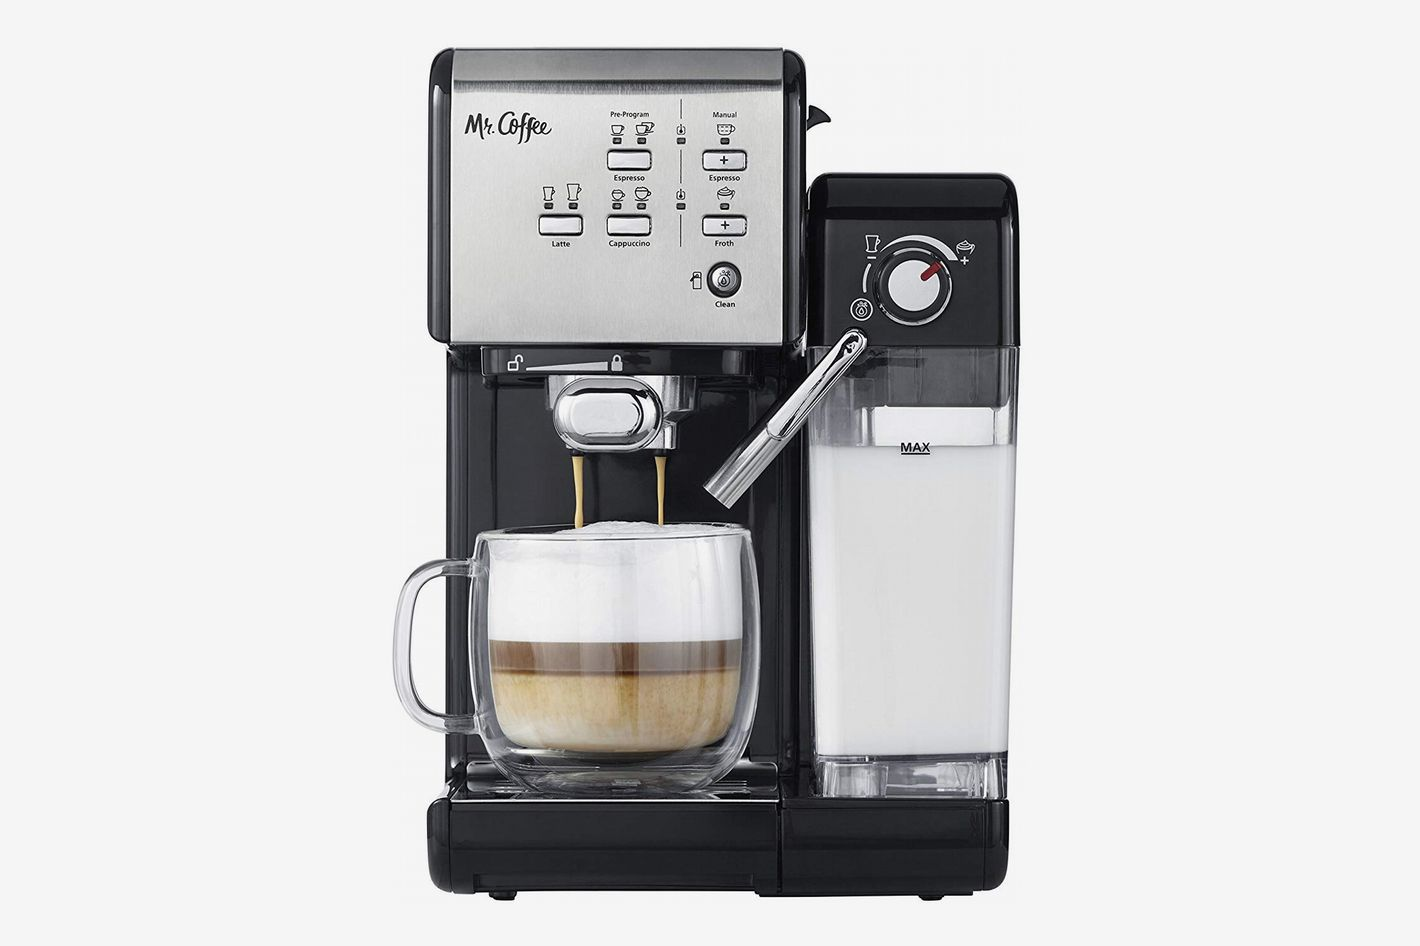 3de661c4d5b5 Mr. Coffee One-Touch CoffeeHouse Espresso Maker and Cappuccino Machine